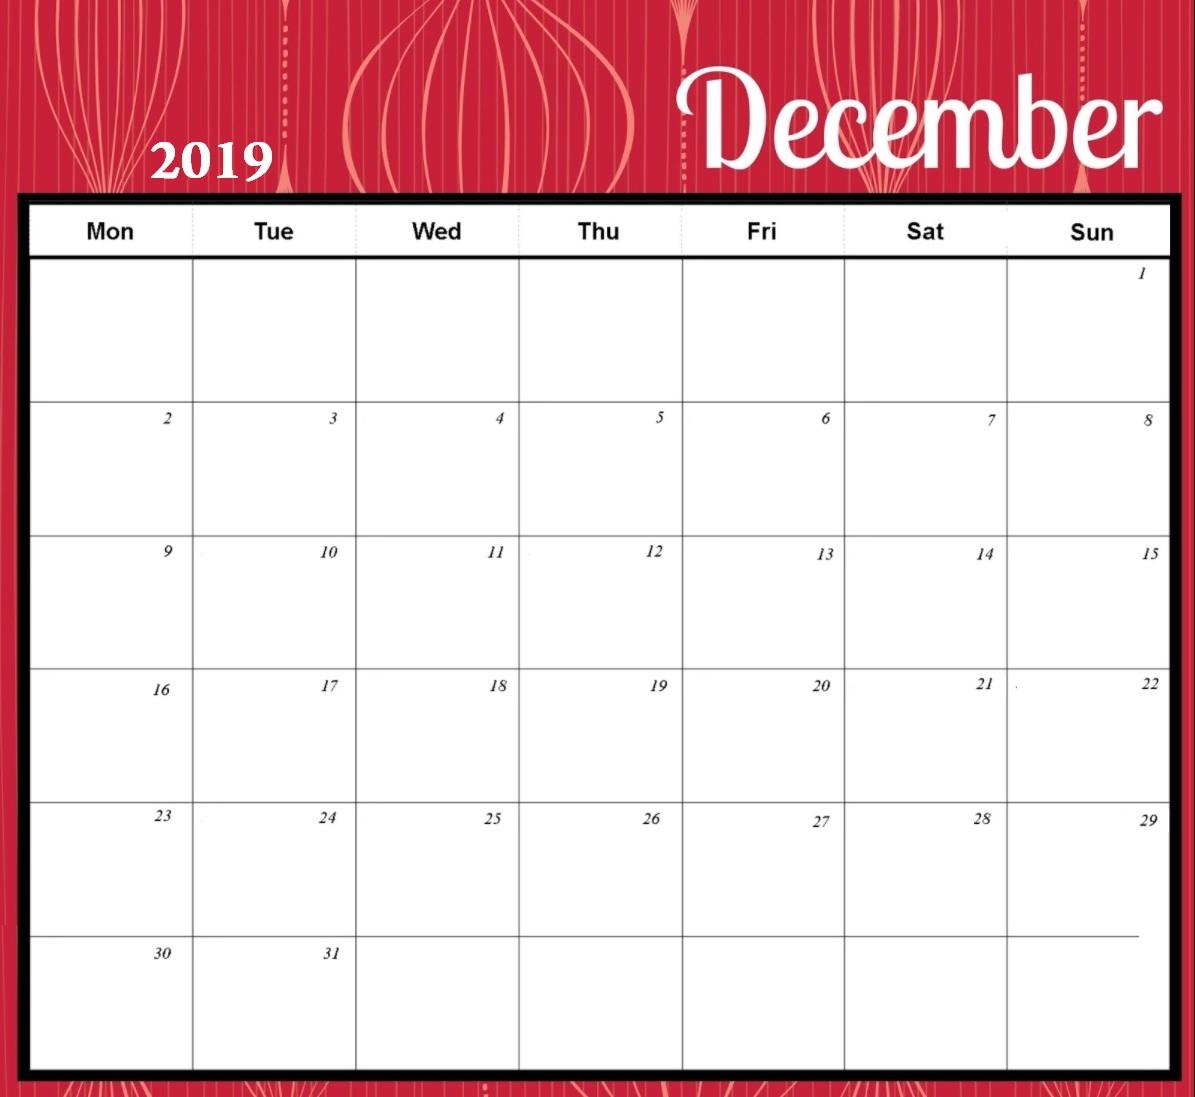 Cute December 2019 Desk Calendar